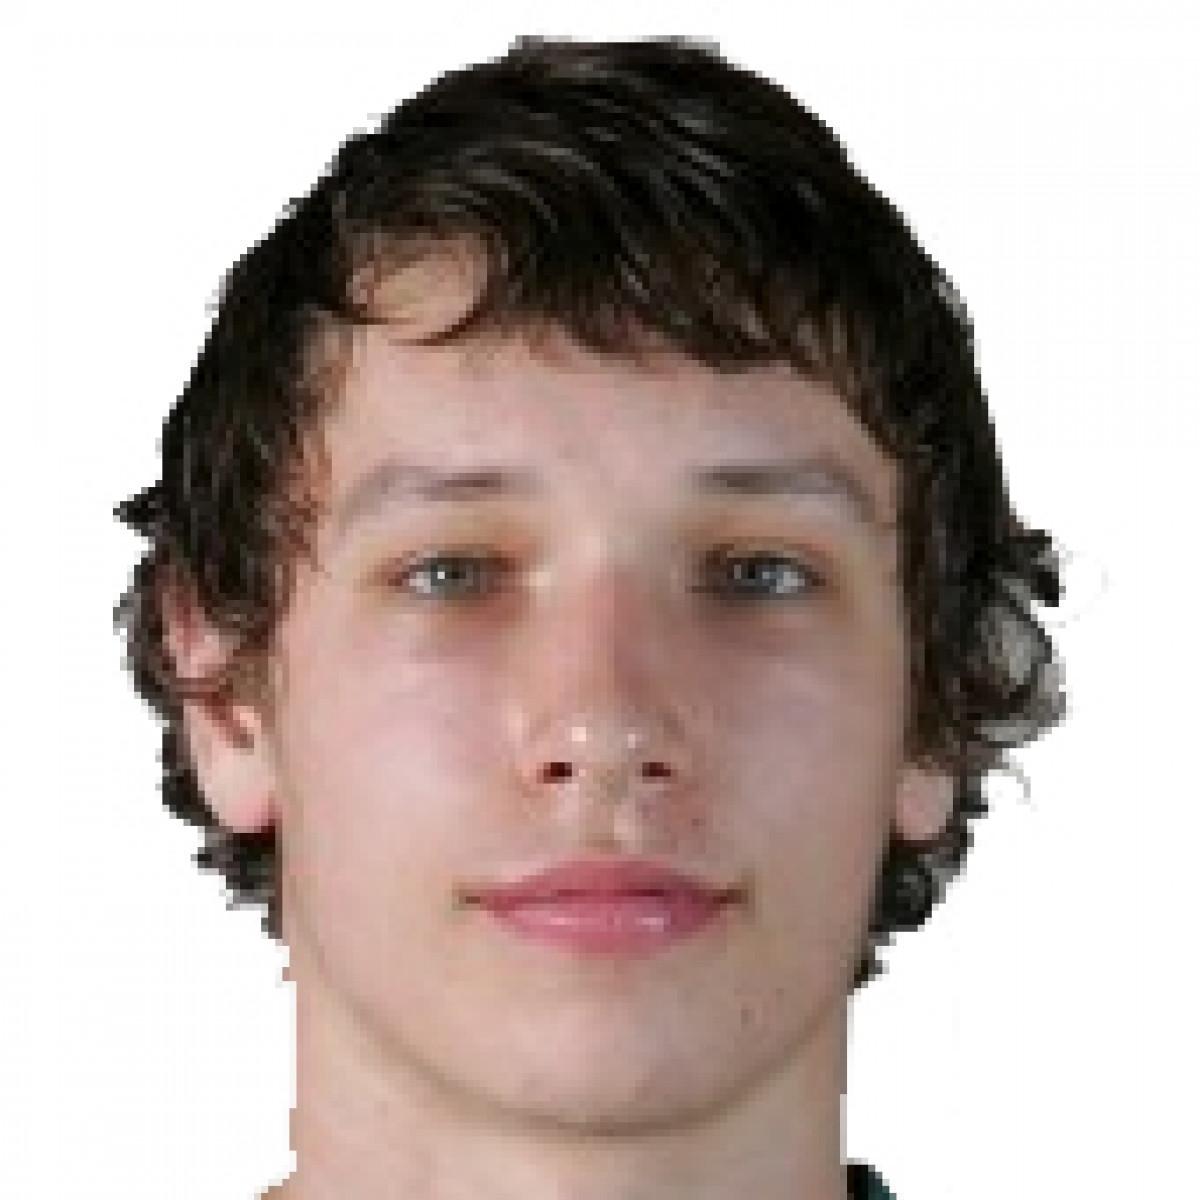 Pavel Ermolinskij